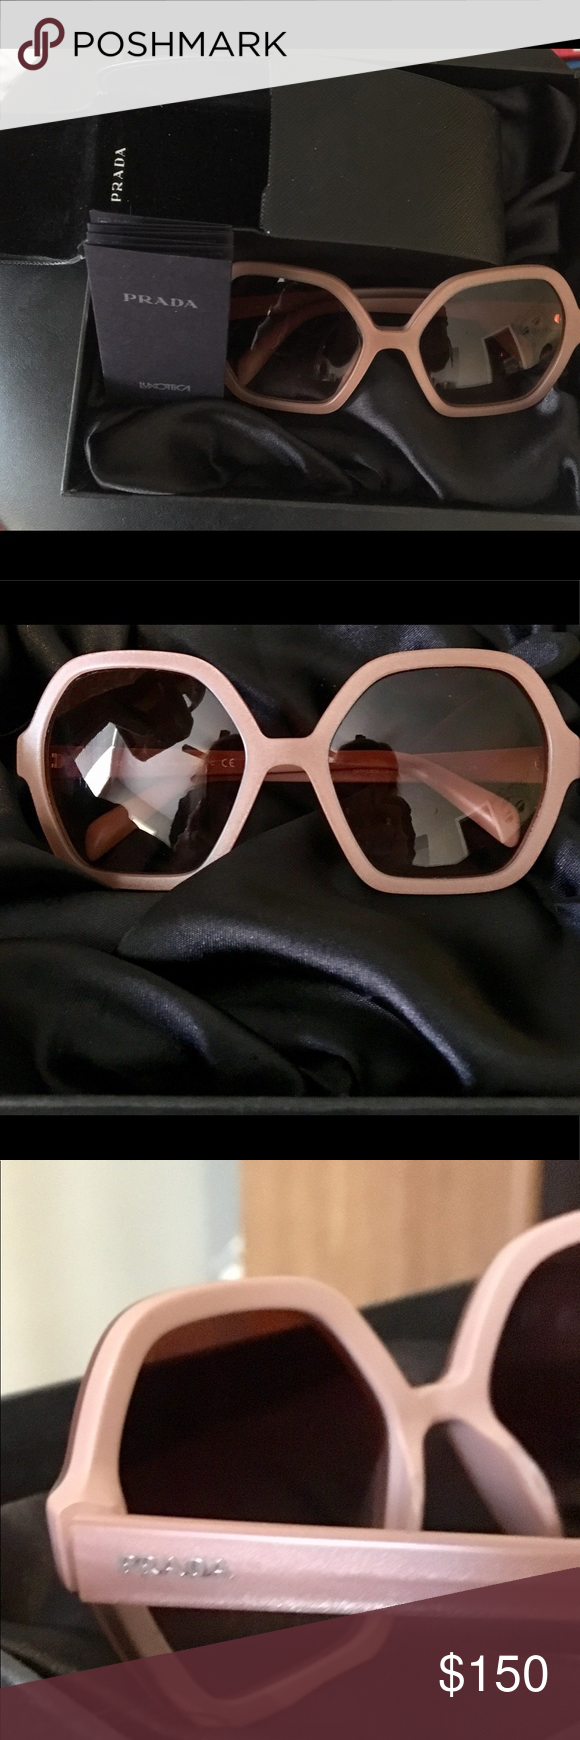 fdff2860e7a5 ... canada new prada pr 06ssf sunglasses includes certificate of  authenticity and original case. feel free